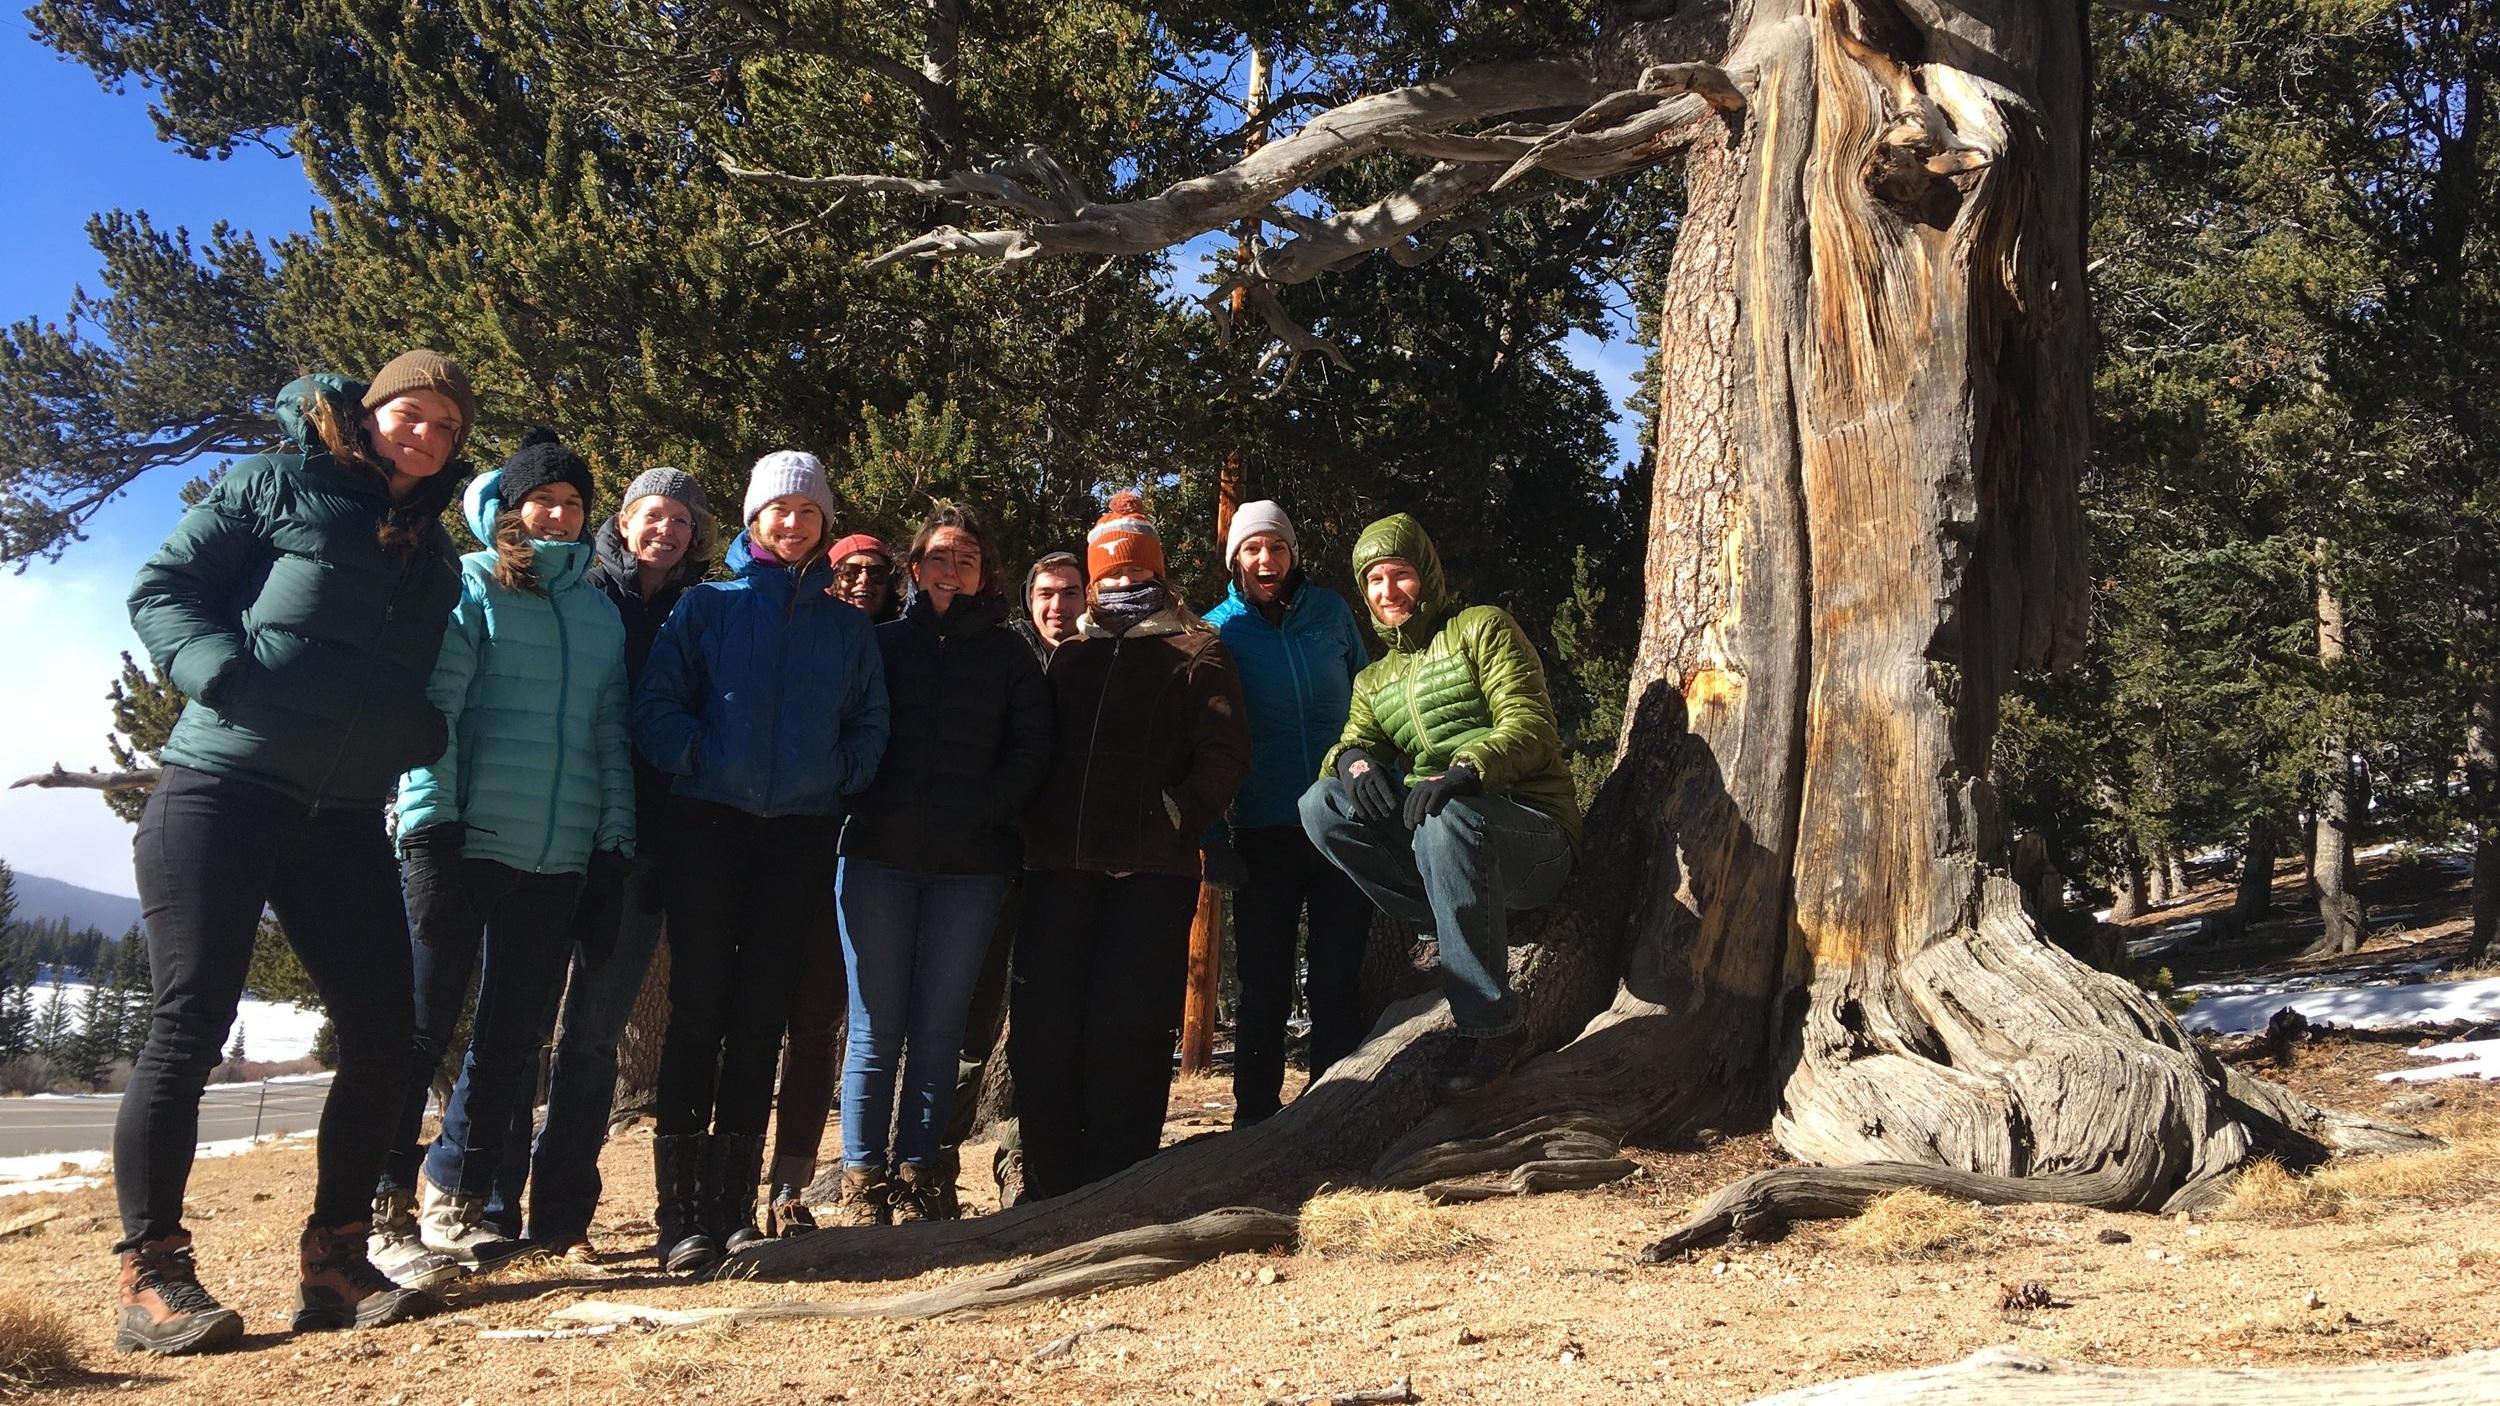 Lab Retreat, Mount Evans 2018: Isabel Schroeter, Ashley Whipple, Katie Suding, Laurel Brigham, Claire Karban, Katie Ebinger, Tom Merchant, Nancy Shackelford, Julie Larson, Cliff Bueno de Mesquita.